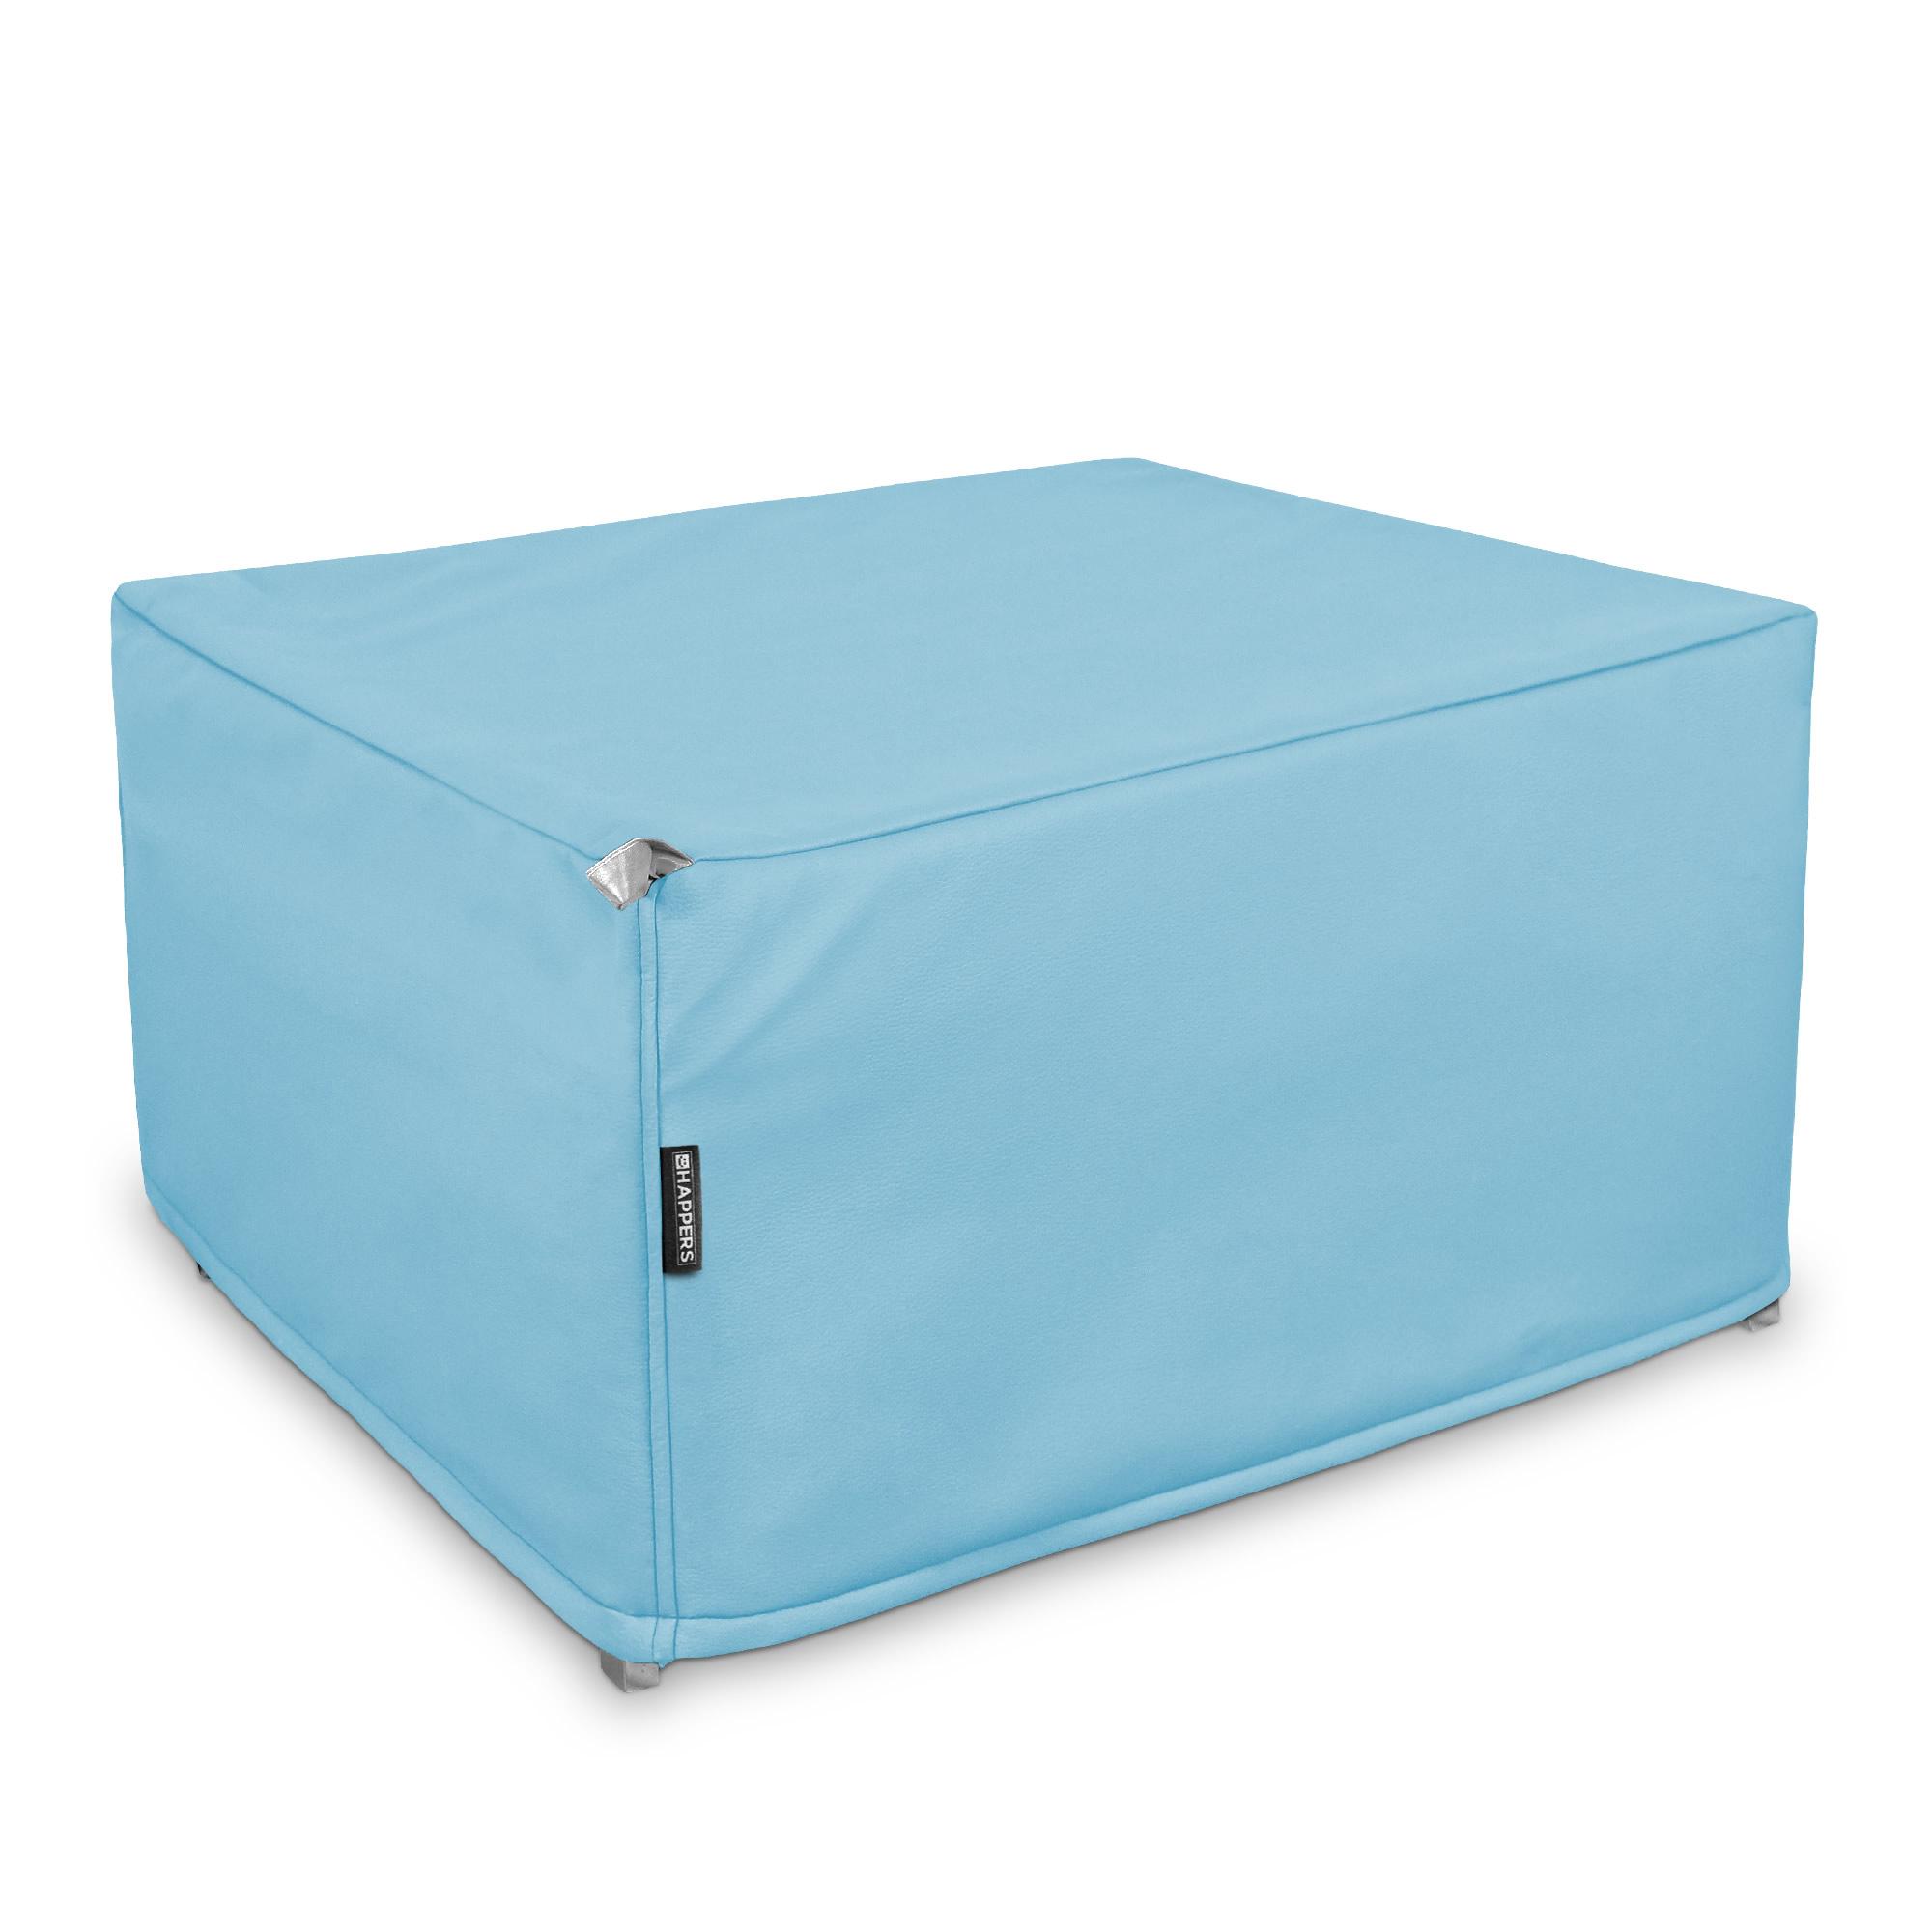 Puff Cama Somier plegable Polipiel Indoor Azul Cielo en puffdepera.com